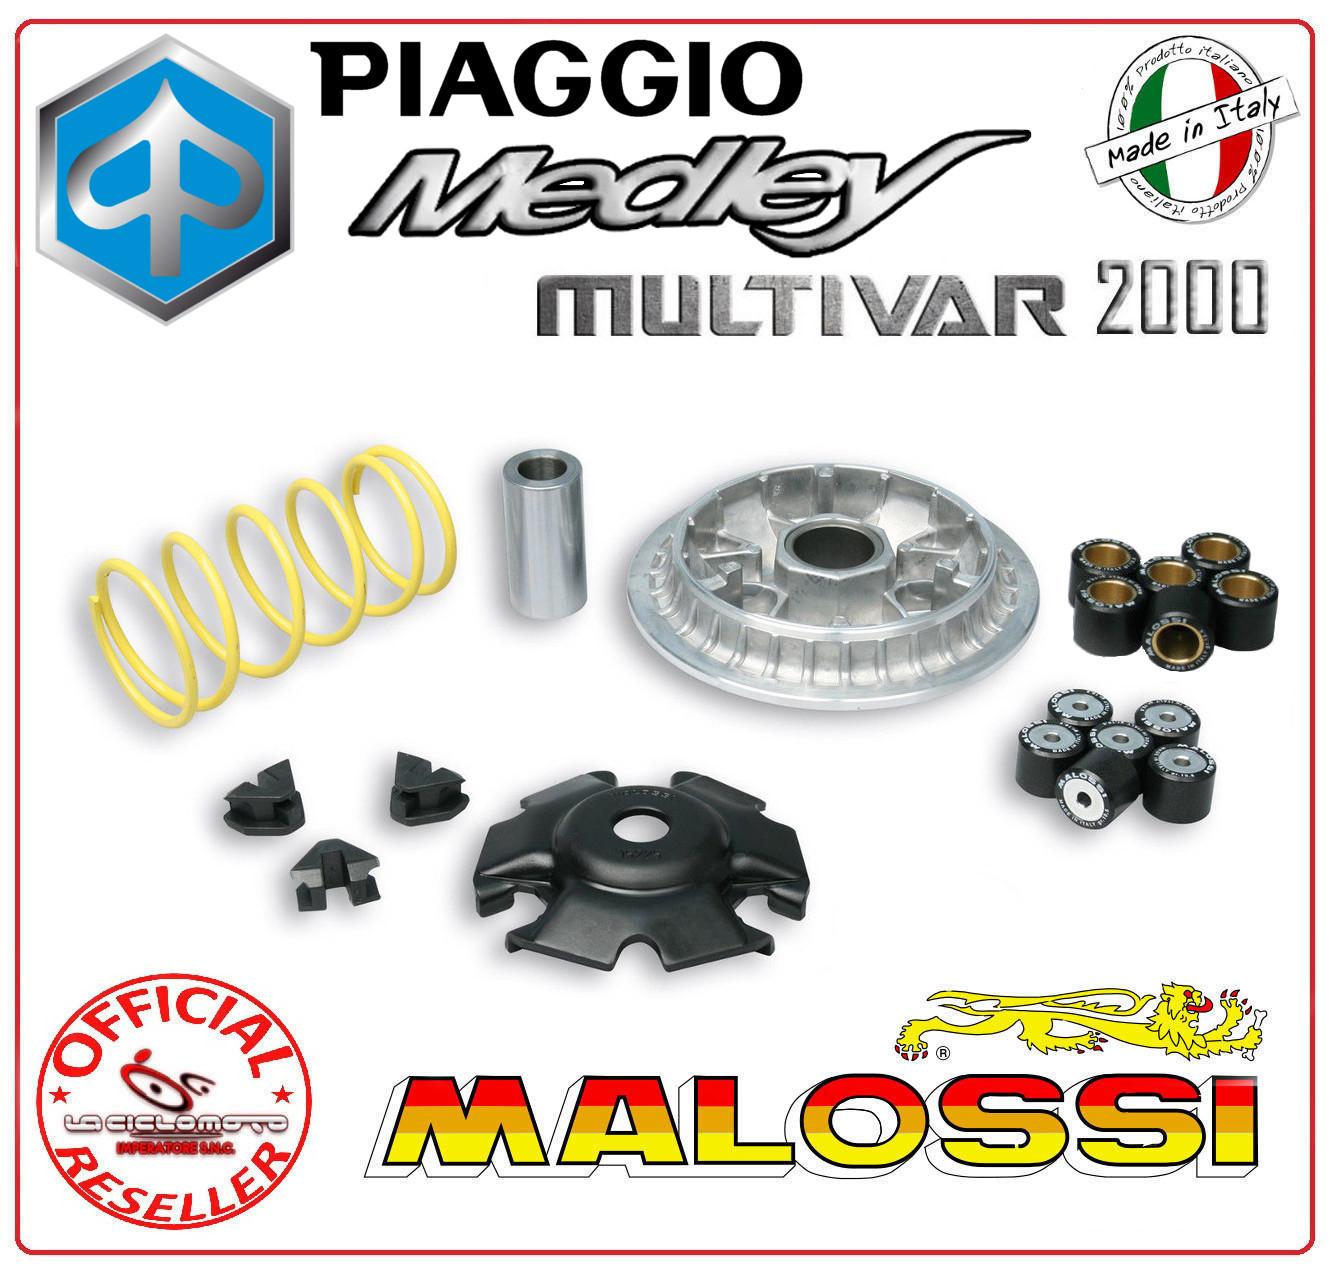 variator multivar 2000 malossi 5117431 piaggio medley 125. Black Bedroom Furniture Sets. Home Design Ideas